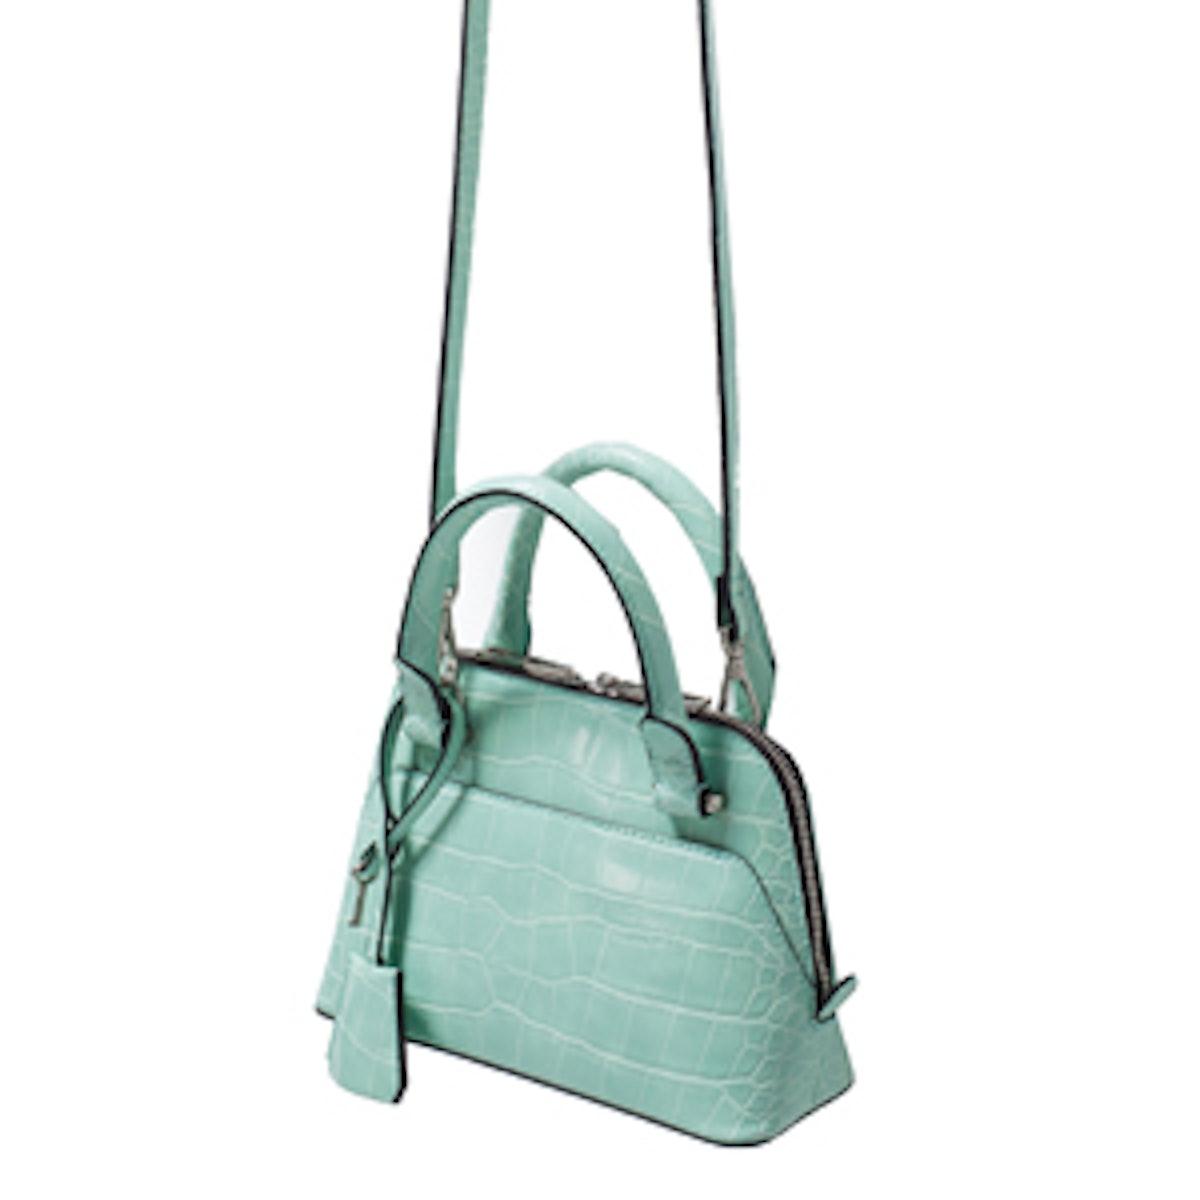 Croc City Mini Bag